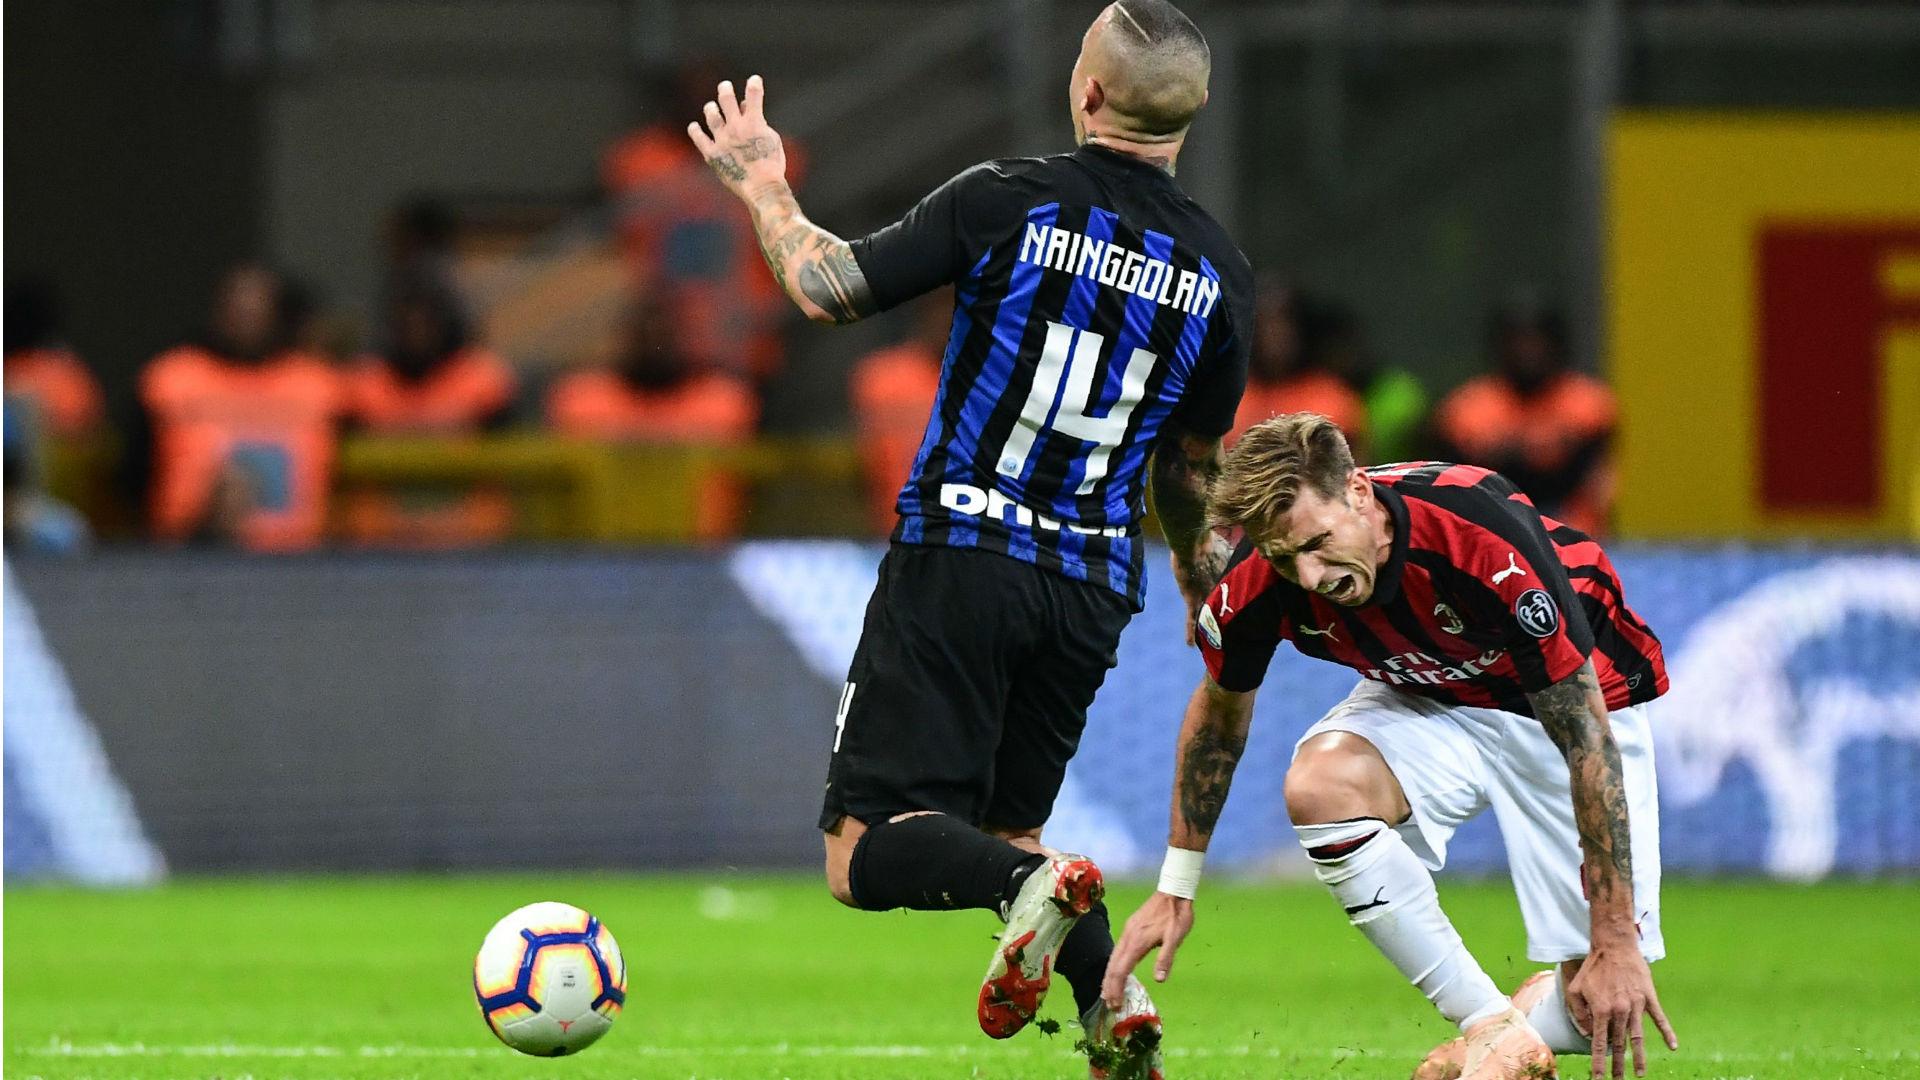 Nainggolan Biglia Inter Milan Serie A